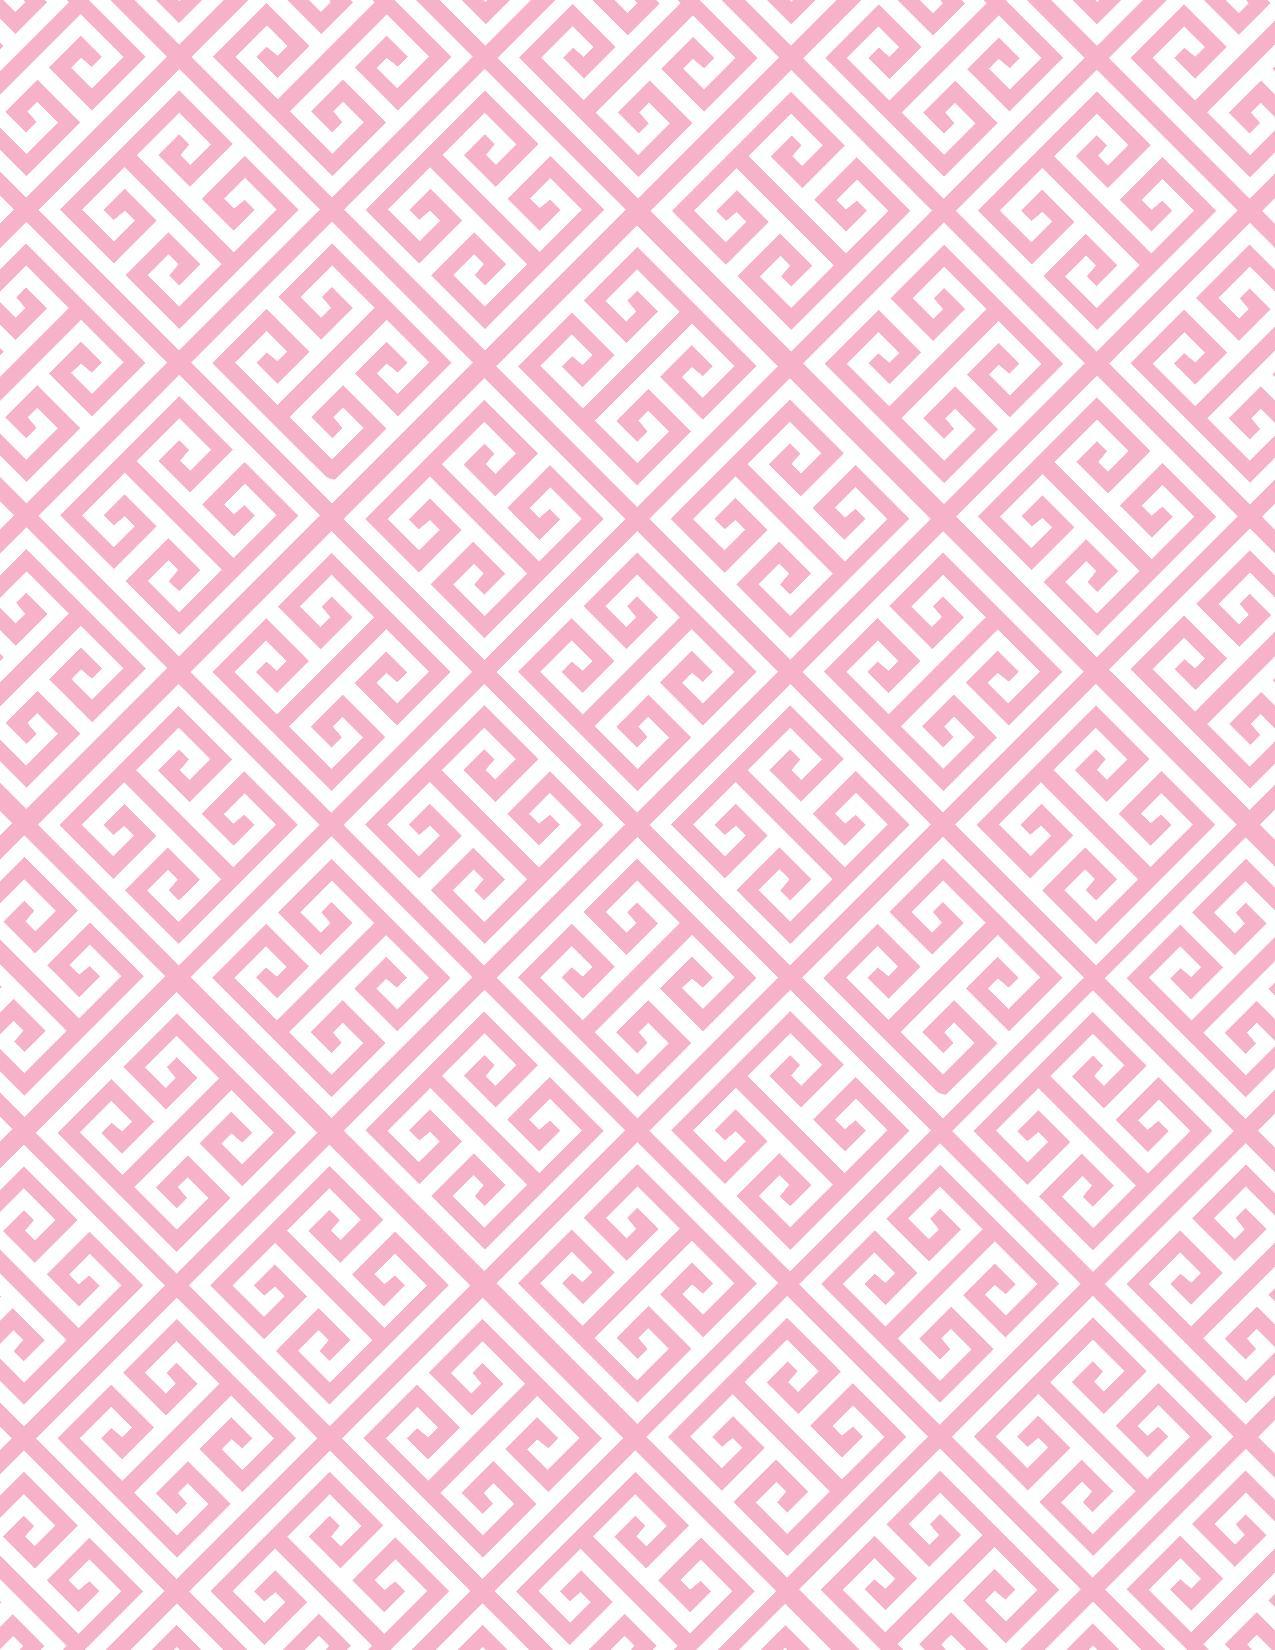 Free-Printable-Digital-Paper-Greek-Key-Light-Pink-Page-001 – Next - Free Printable Paper